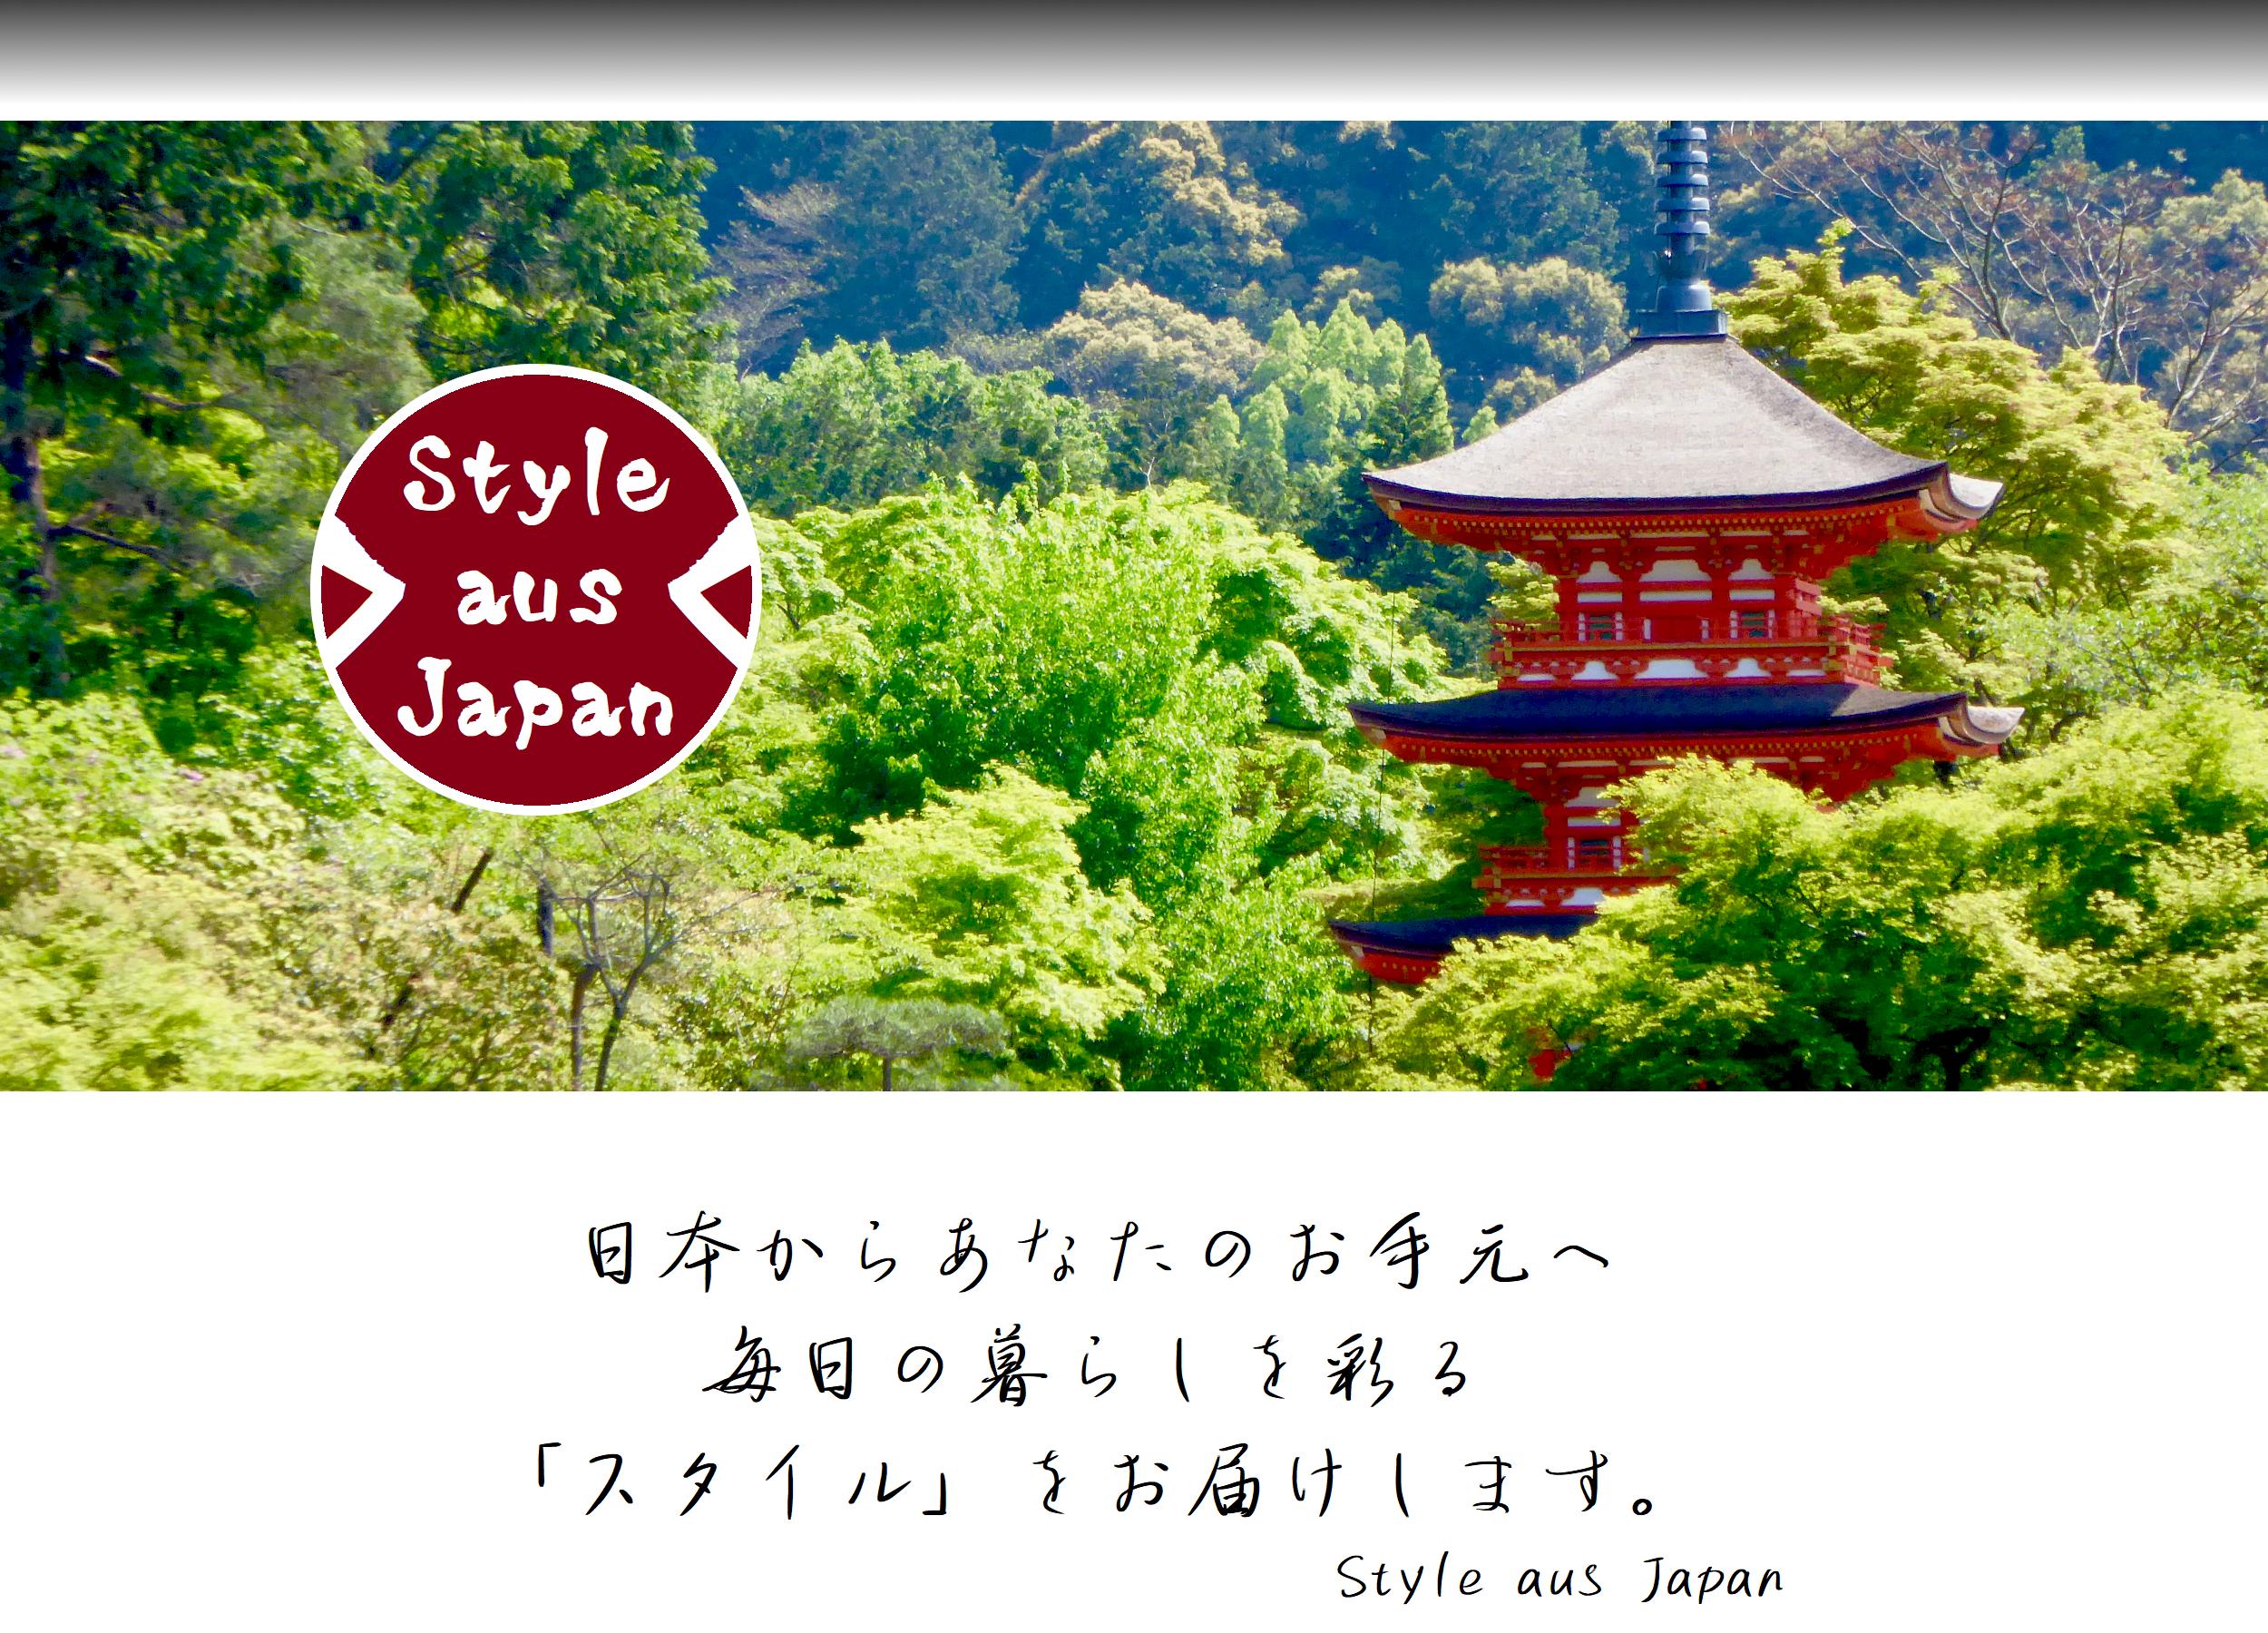 Style aus Japan